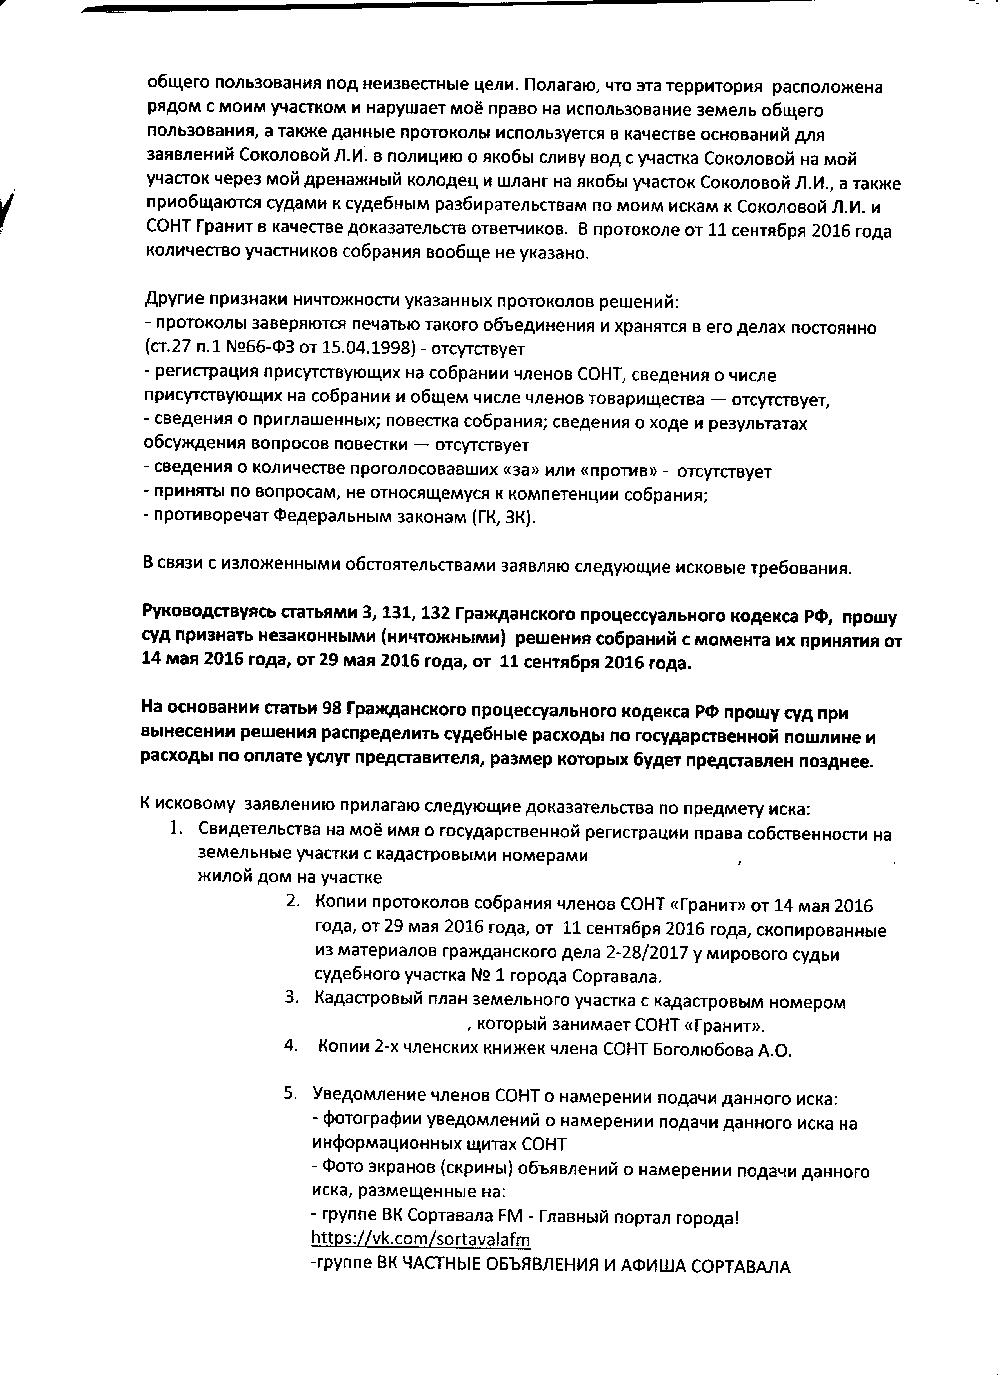 https://sontgranit.ru/forum/img/sokol/скан-иска-03.png